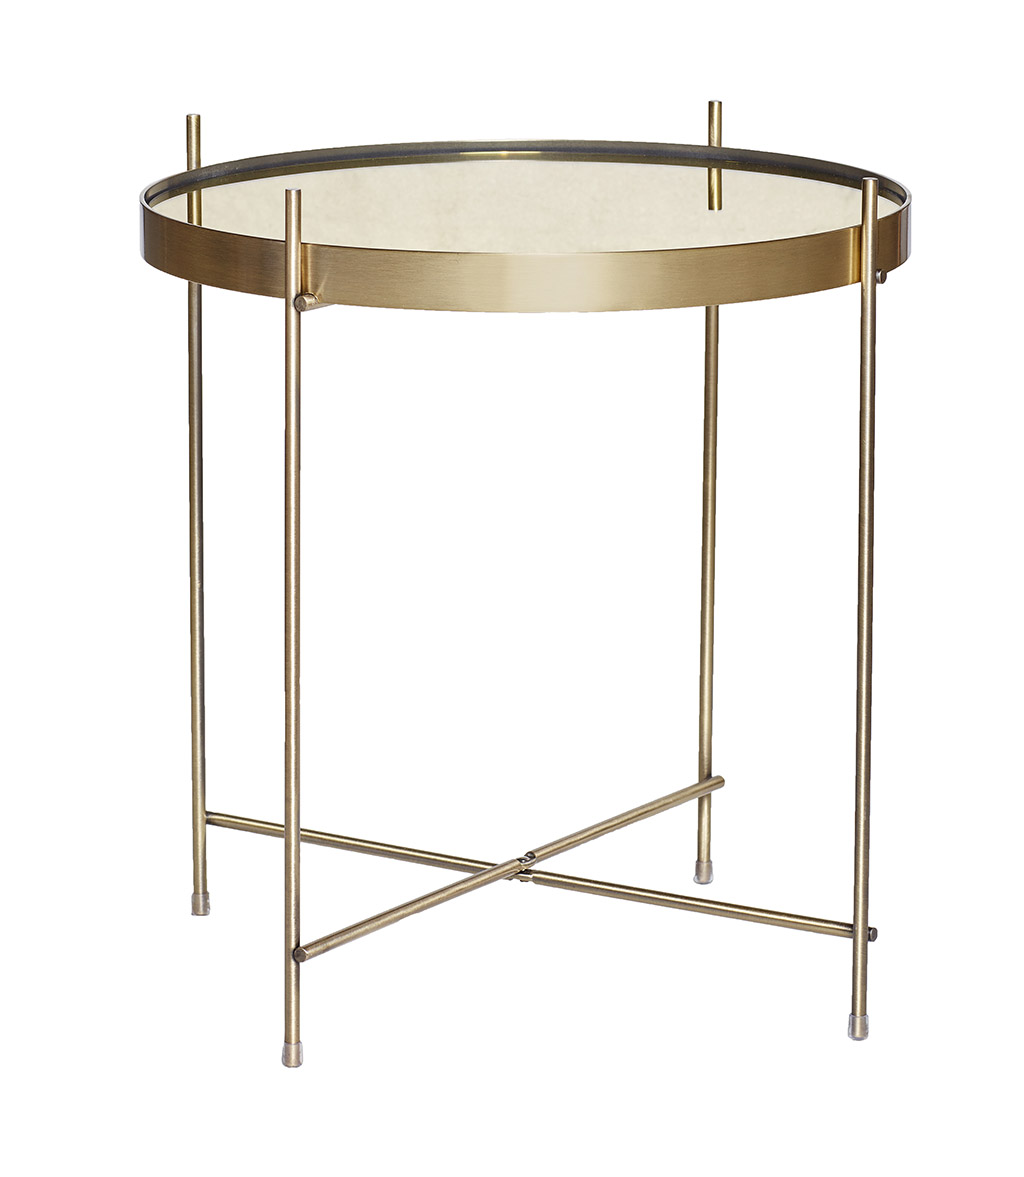 Image of   Hübsch Rundt bord i metal/spejl, guld